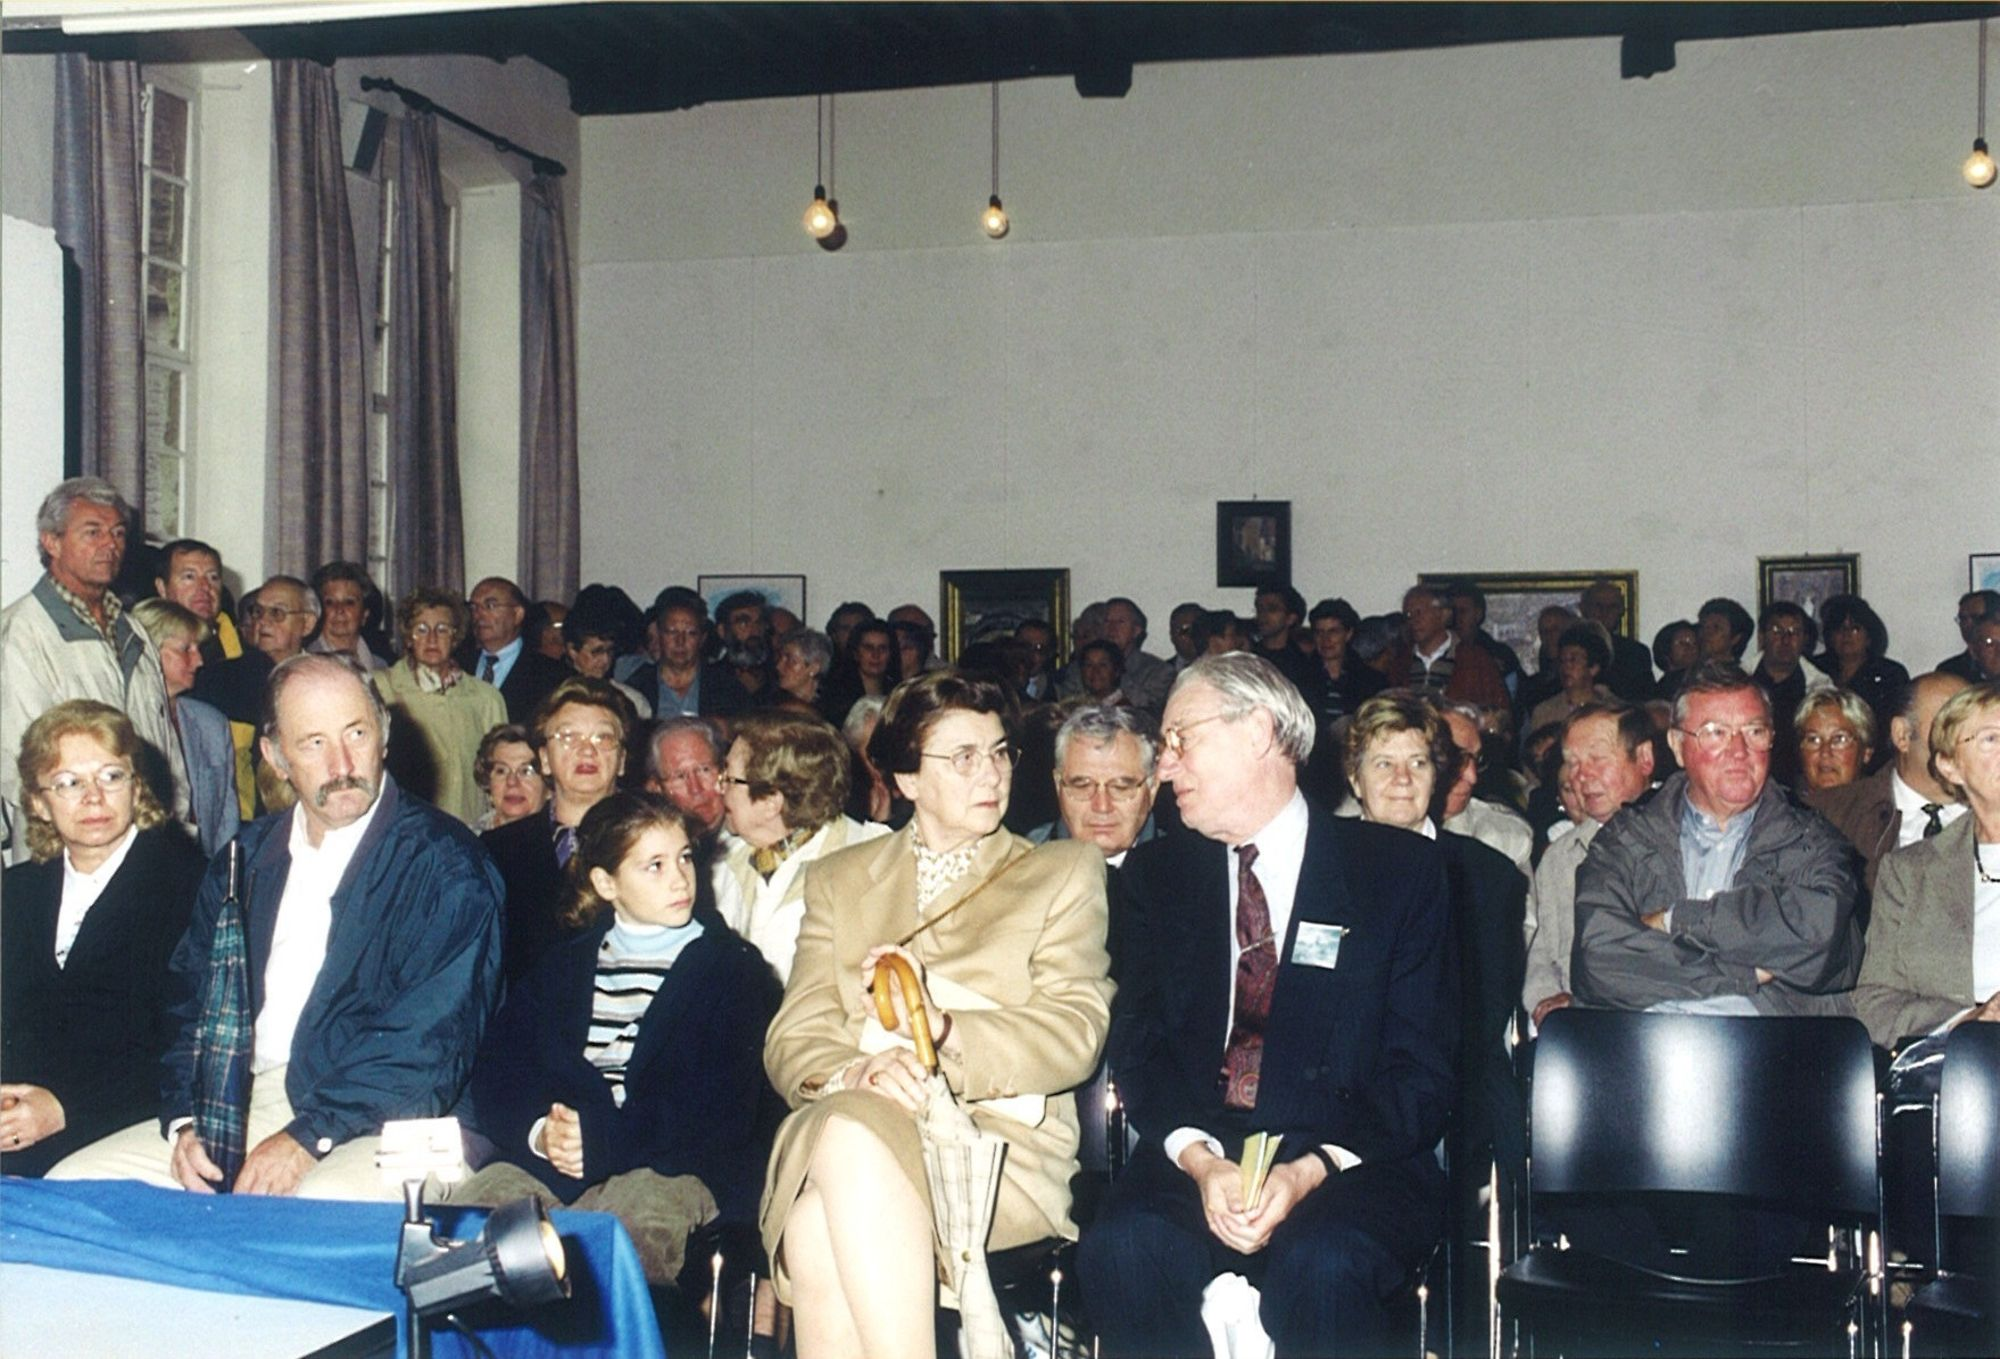 inhuldiging beeld Marcella Pattyn